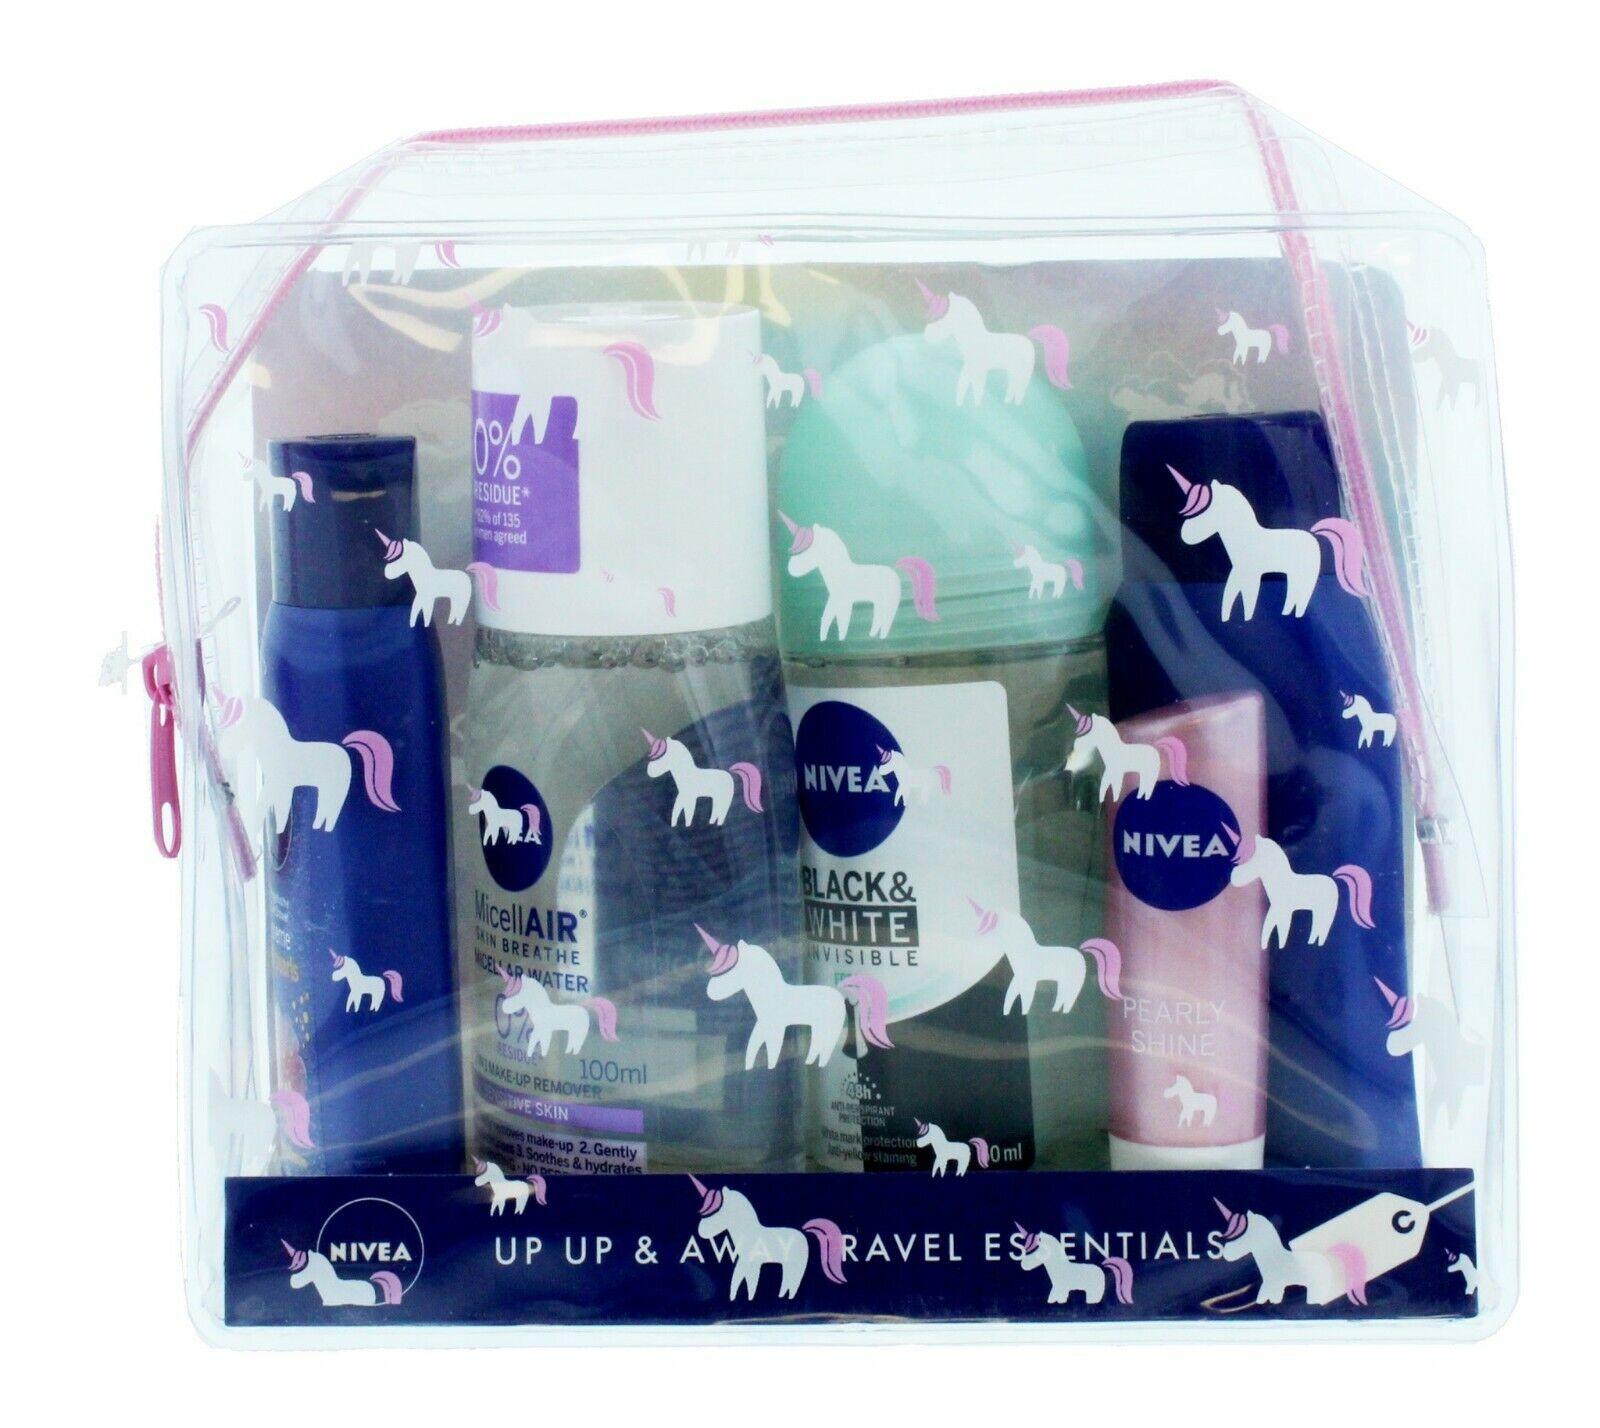 Nivea Up Up & Away Travel Essentials Gift Set - Travel Size